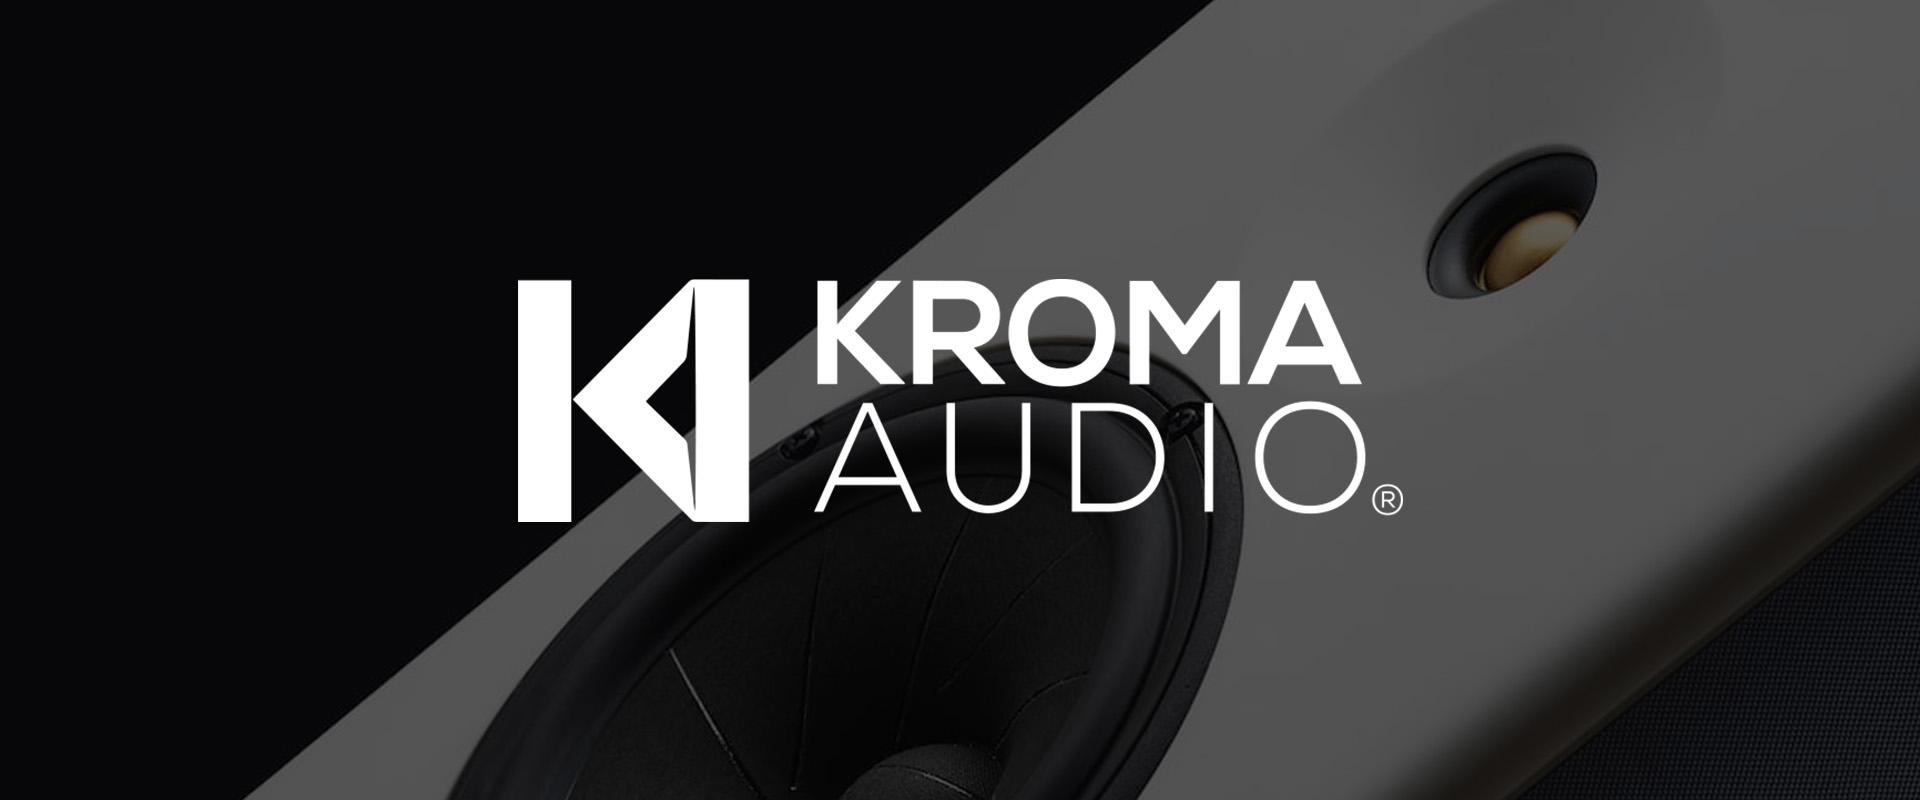 Kroma Audio